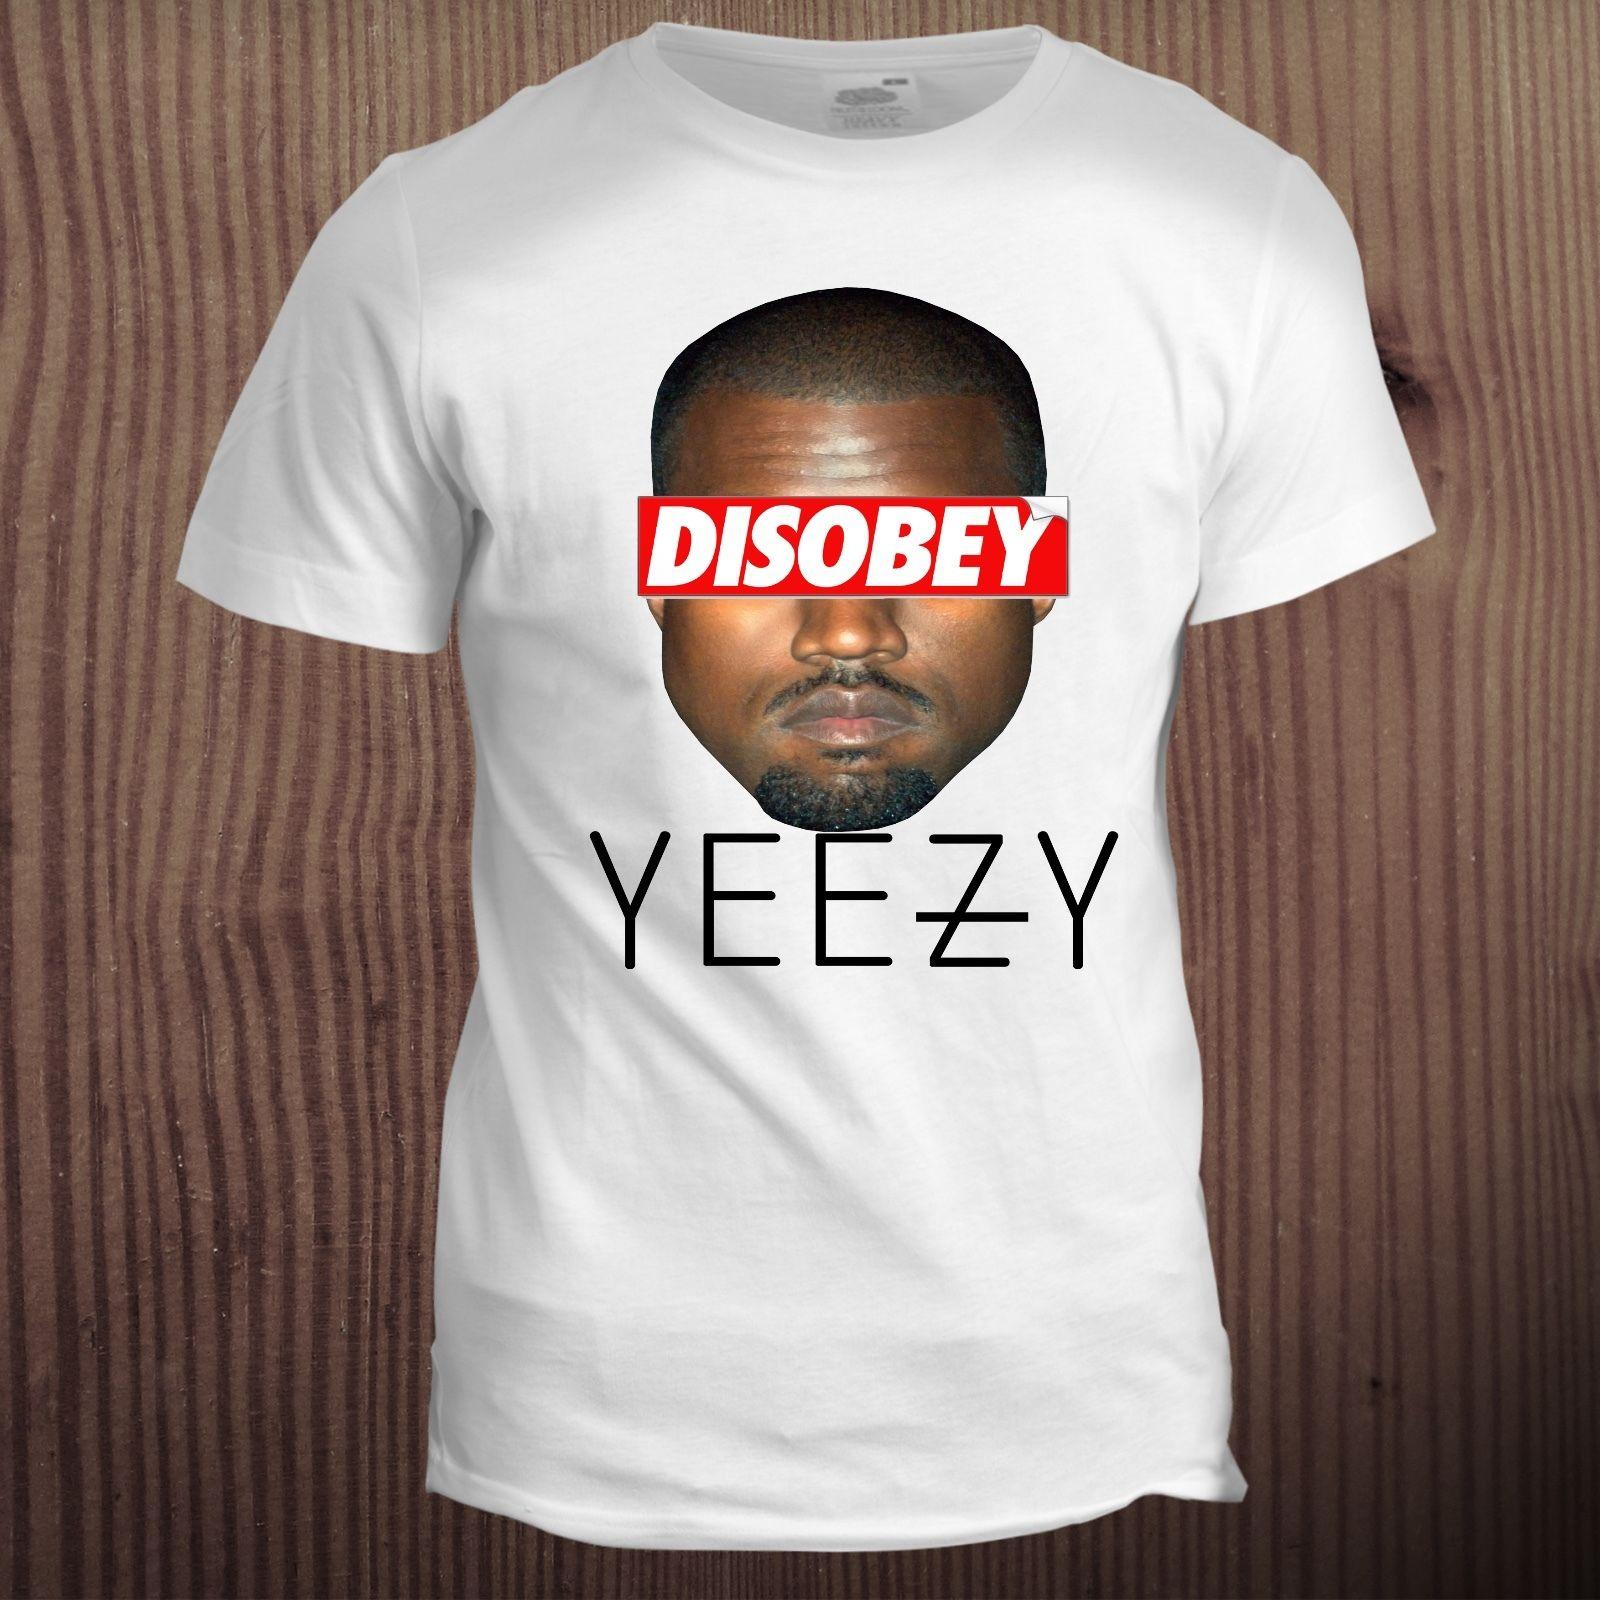 946d70c04 Disobey Anonymous Kanye West Life Of Pablo Vendetta Conspiracy Urban T  Shirt Custom T Shirt Logo Text Photo Mens Womens T Shirt Cool T Shirts  Design Designs ...